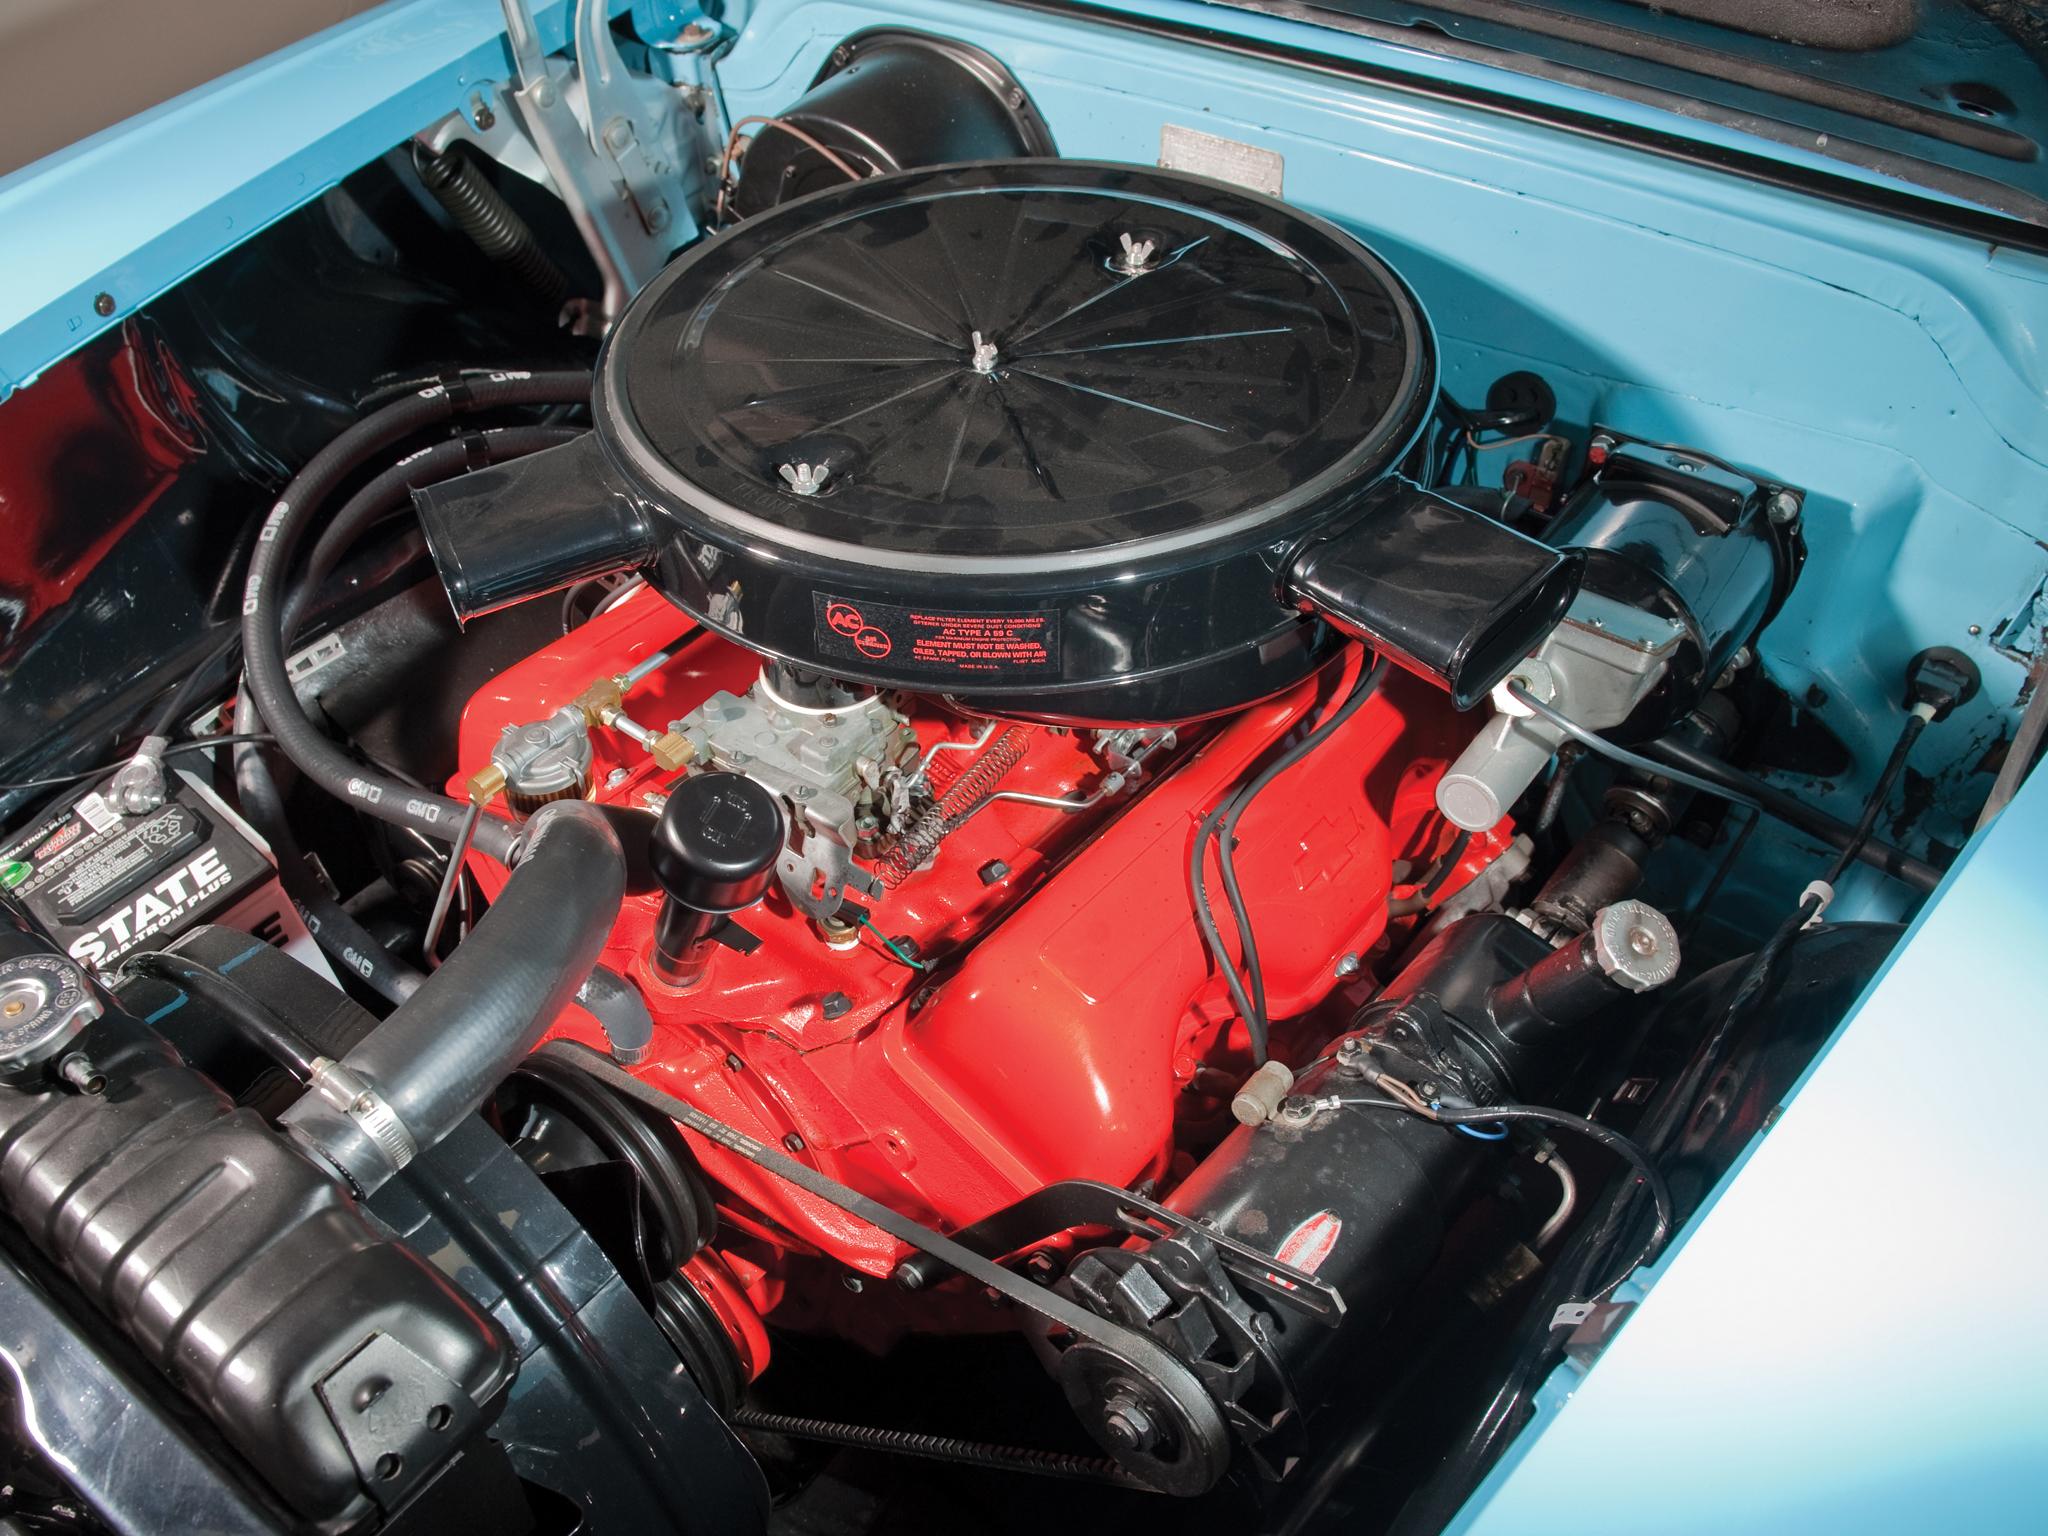 1958 chevrolet bel air impala 348 super turbo thrust tri power convertible retro engine g wallpaper 2048x1536 199883 wallpaperup